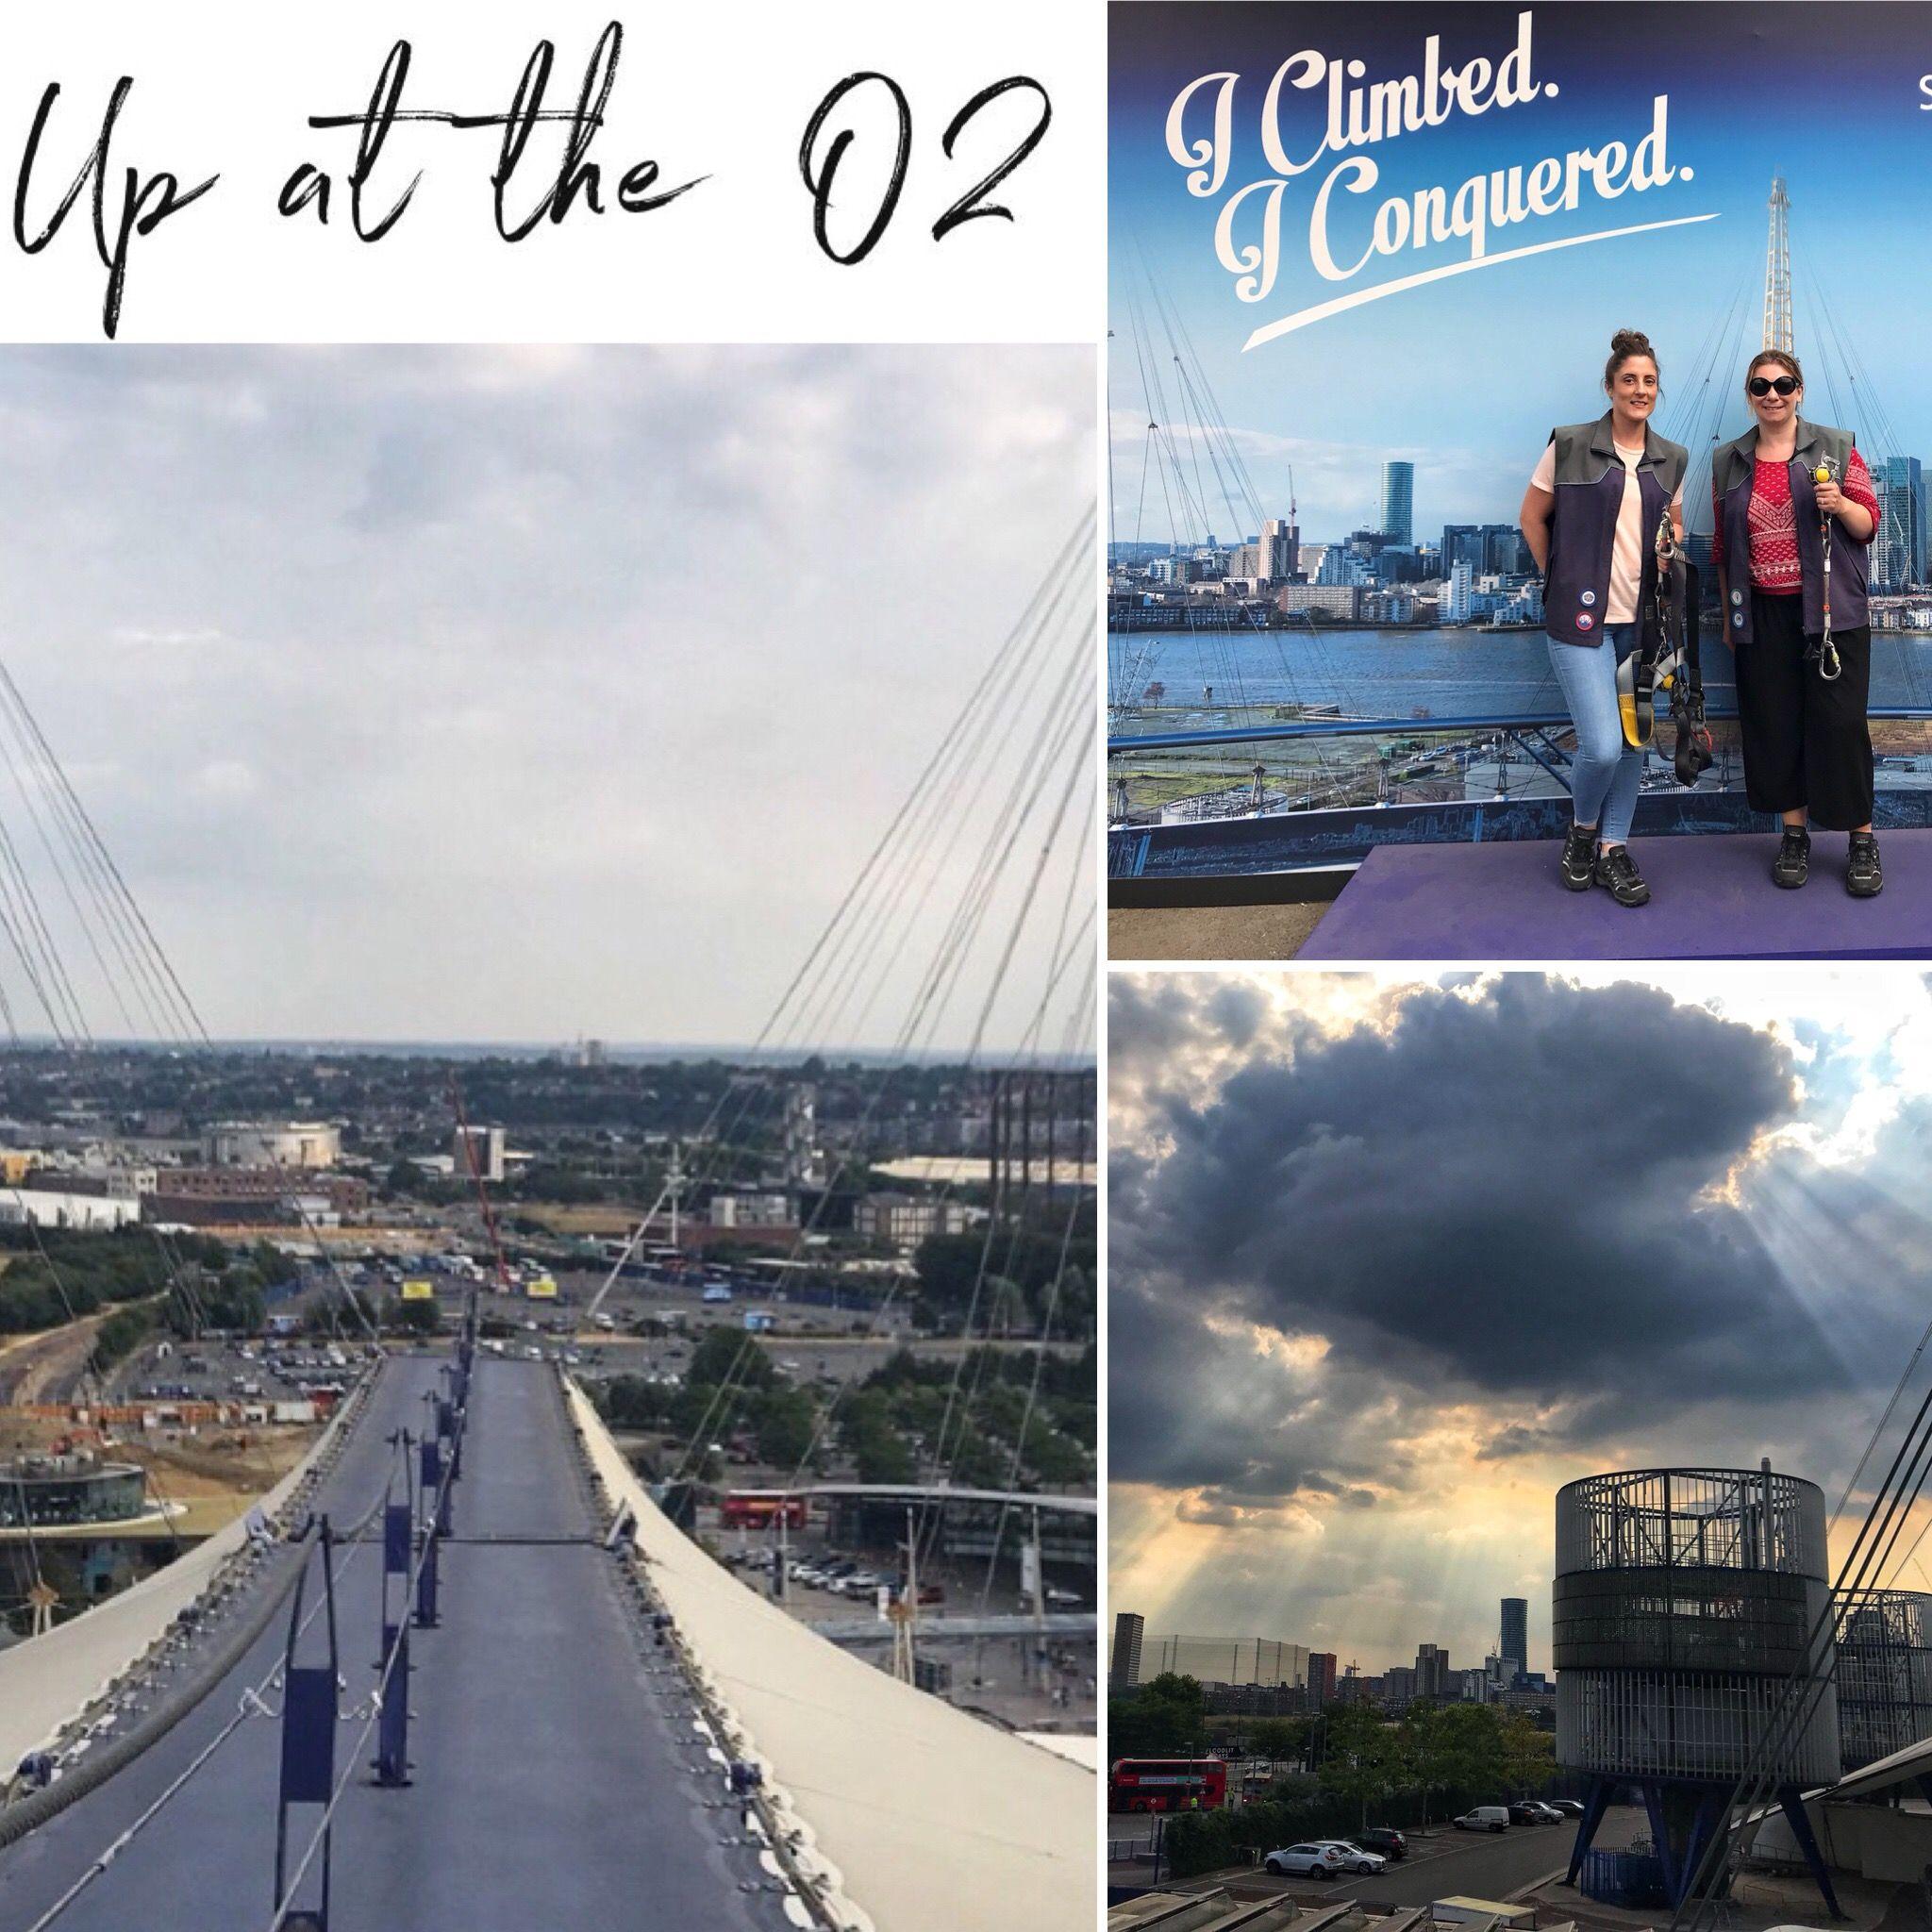 Climbing New Heights Up at the O2 London & Aqua Parcs Fun in MK